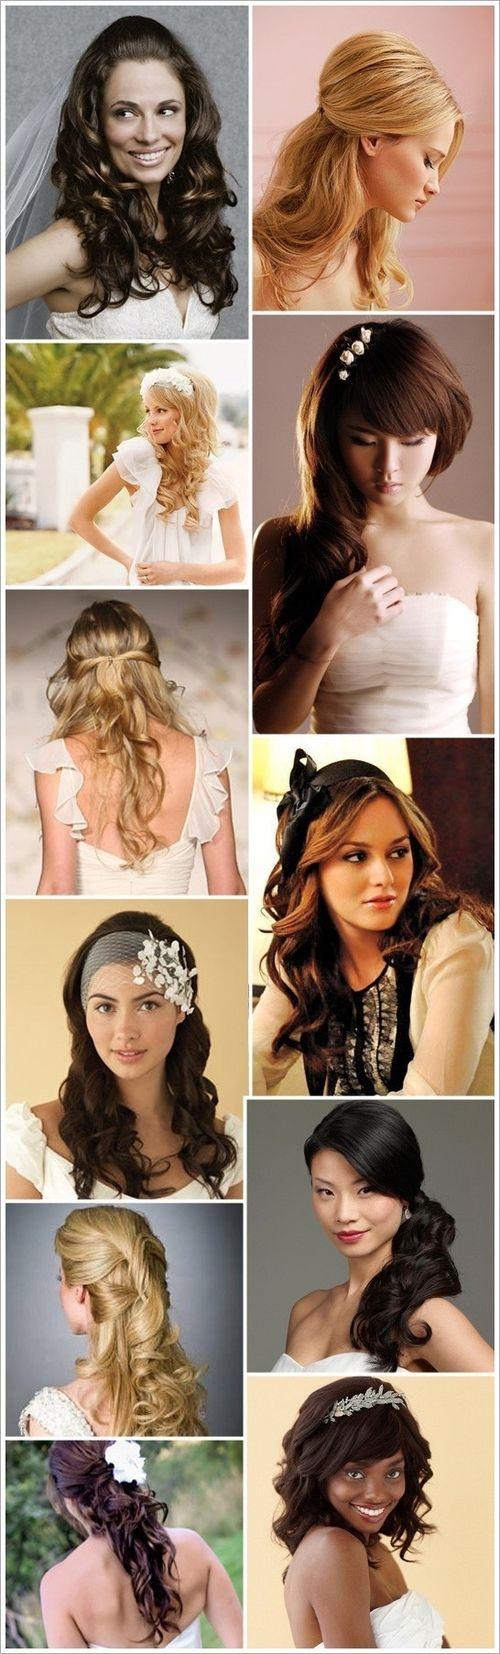 Bridal Hairstyles For Long Hair